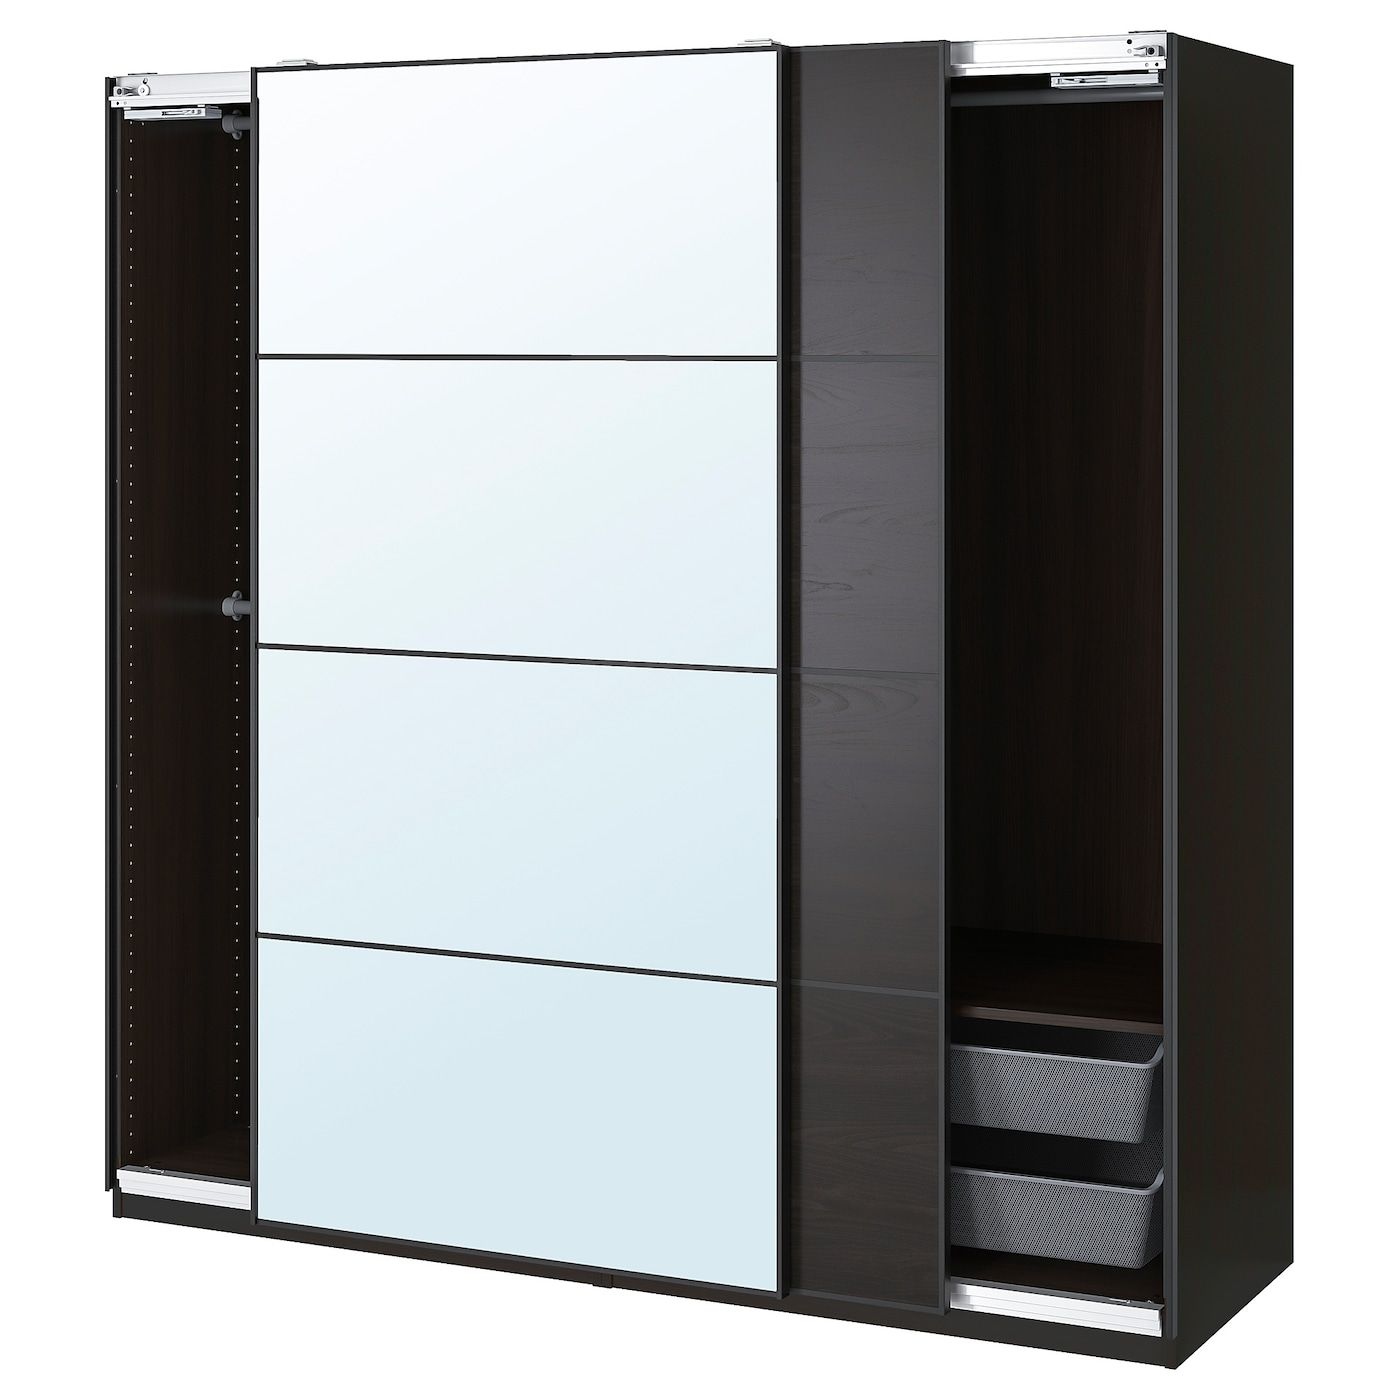 Pax Mehamn Auli Wardrobe Combination Black Brown Mirror Glass 78 3 4x26x79 1 4 Ikea In 2020 Ikea Pax Glass Mirror Brown Mirror